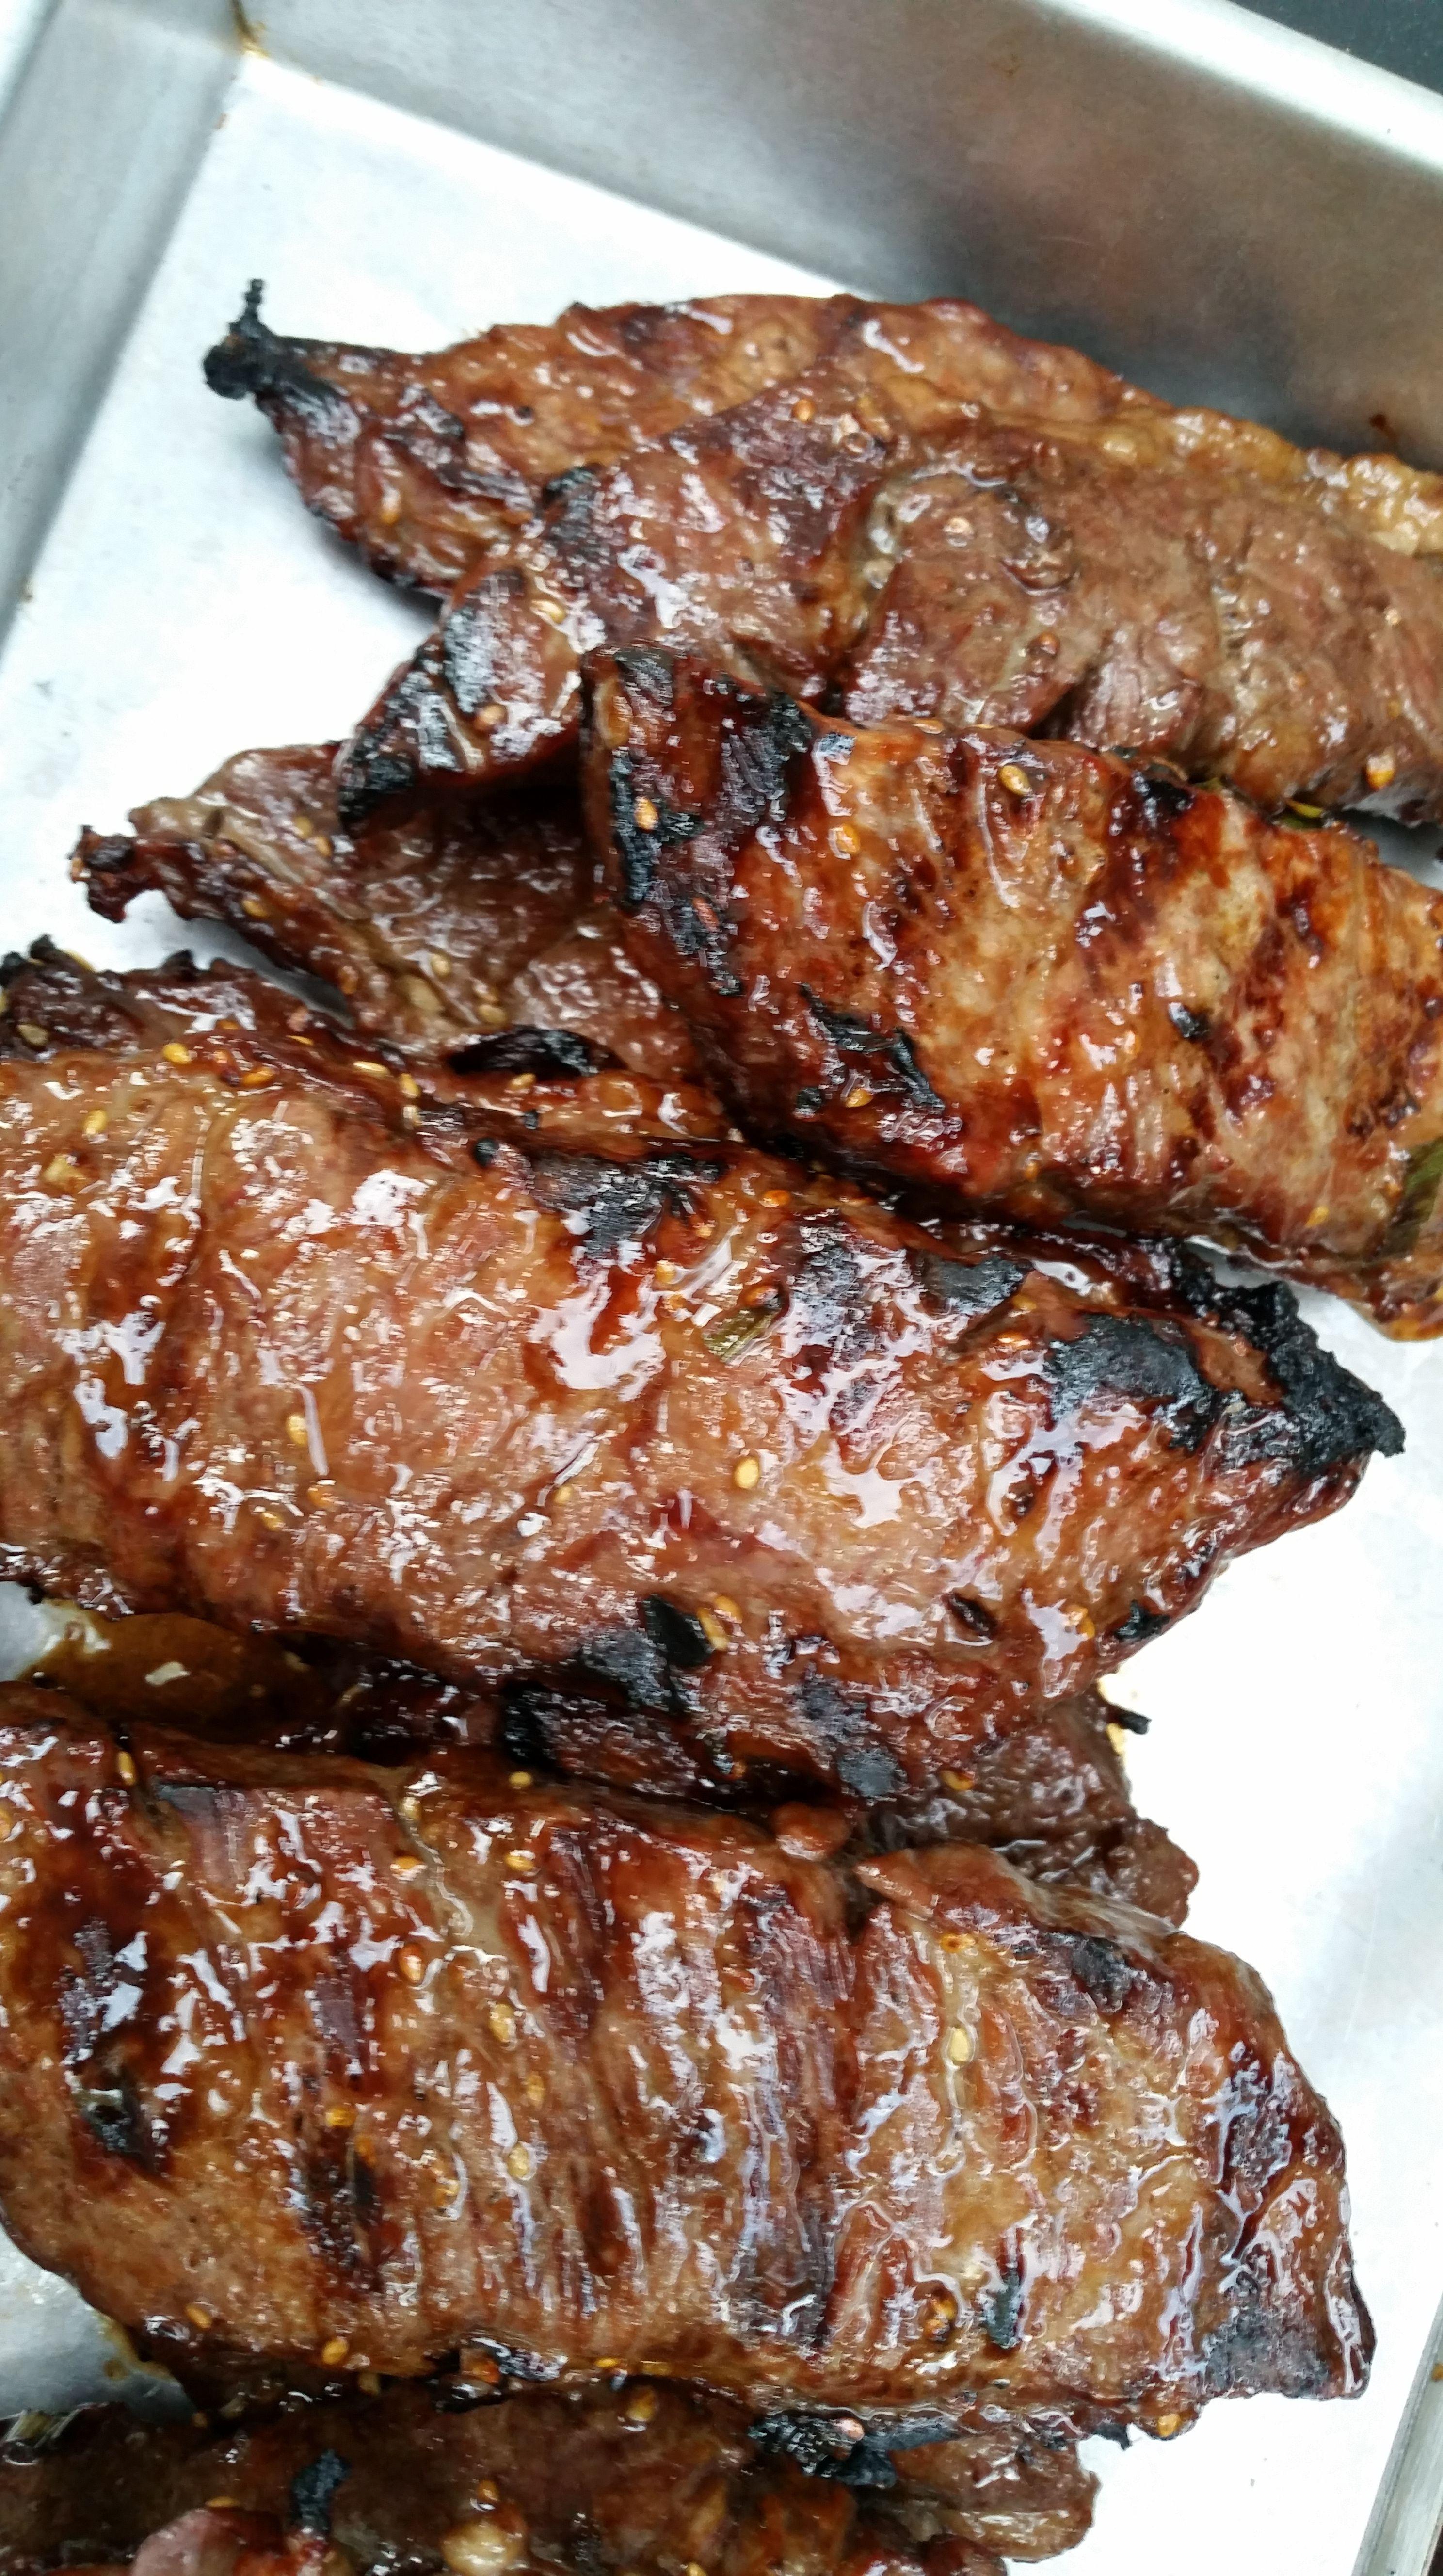 Galbi Korean Bbq Beef Short Ribs The Secret Formula Recipe Is Still Legit Let Me See Your Grill Bbq Beef Short Ribs Korean Bbq Beef Short Ribs